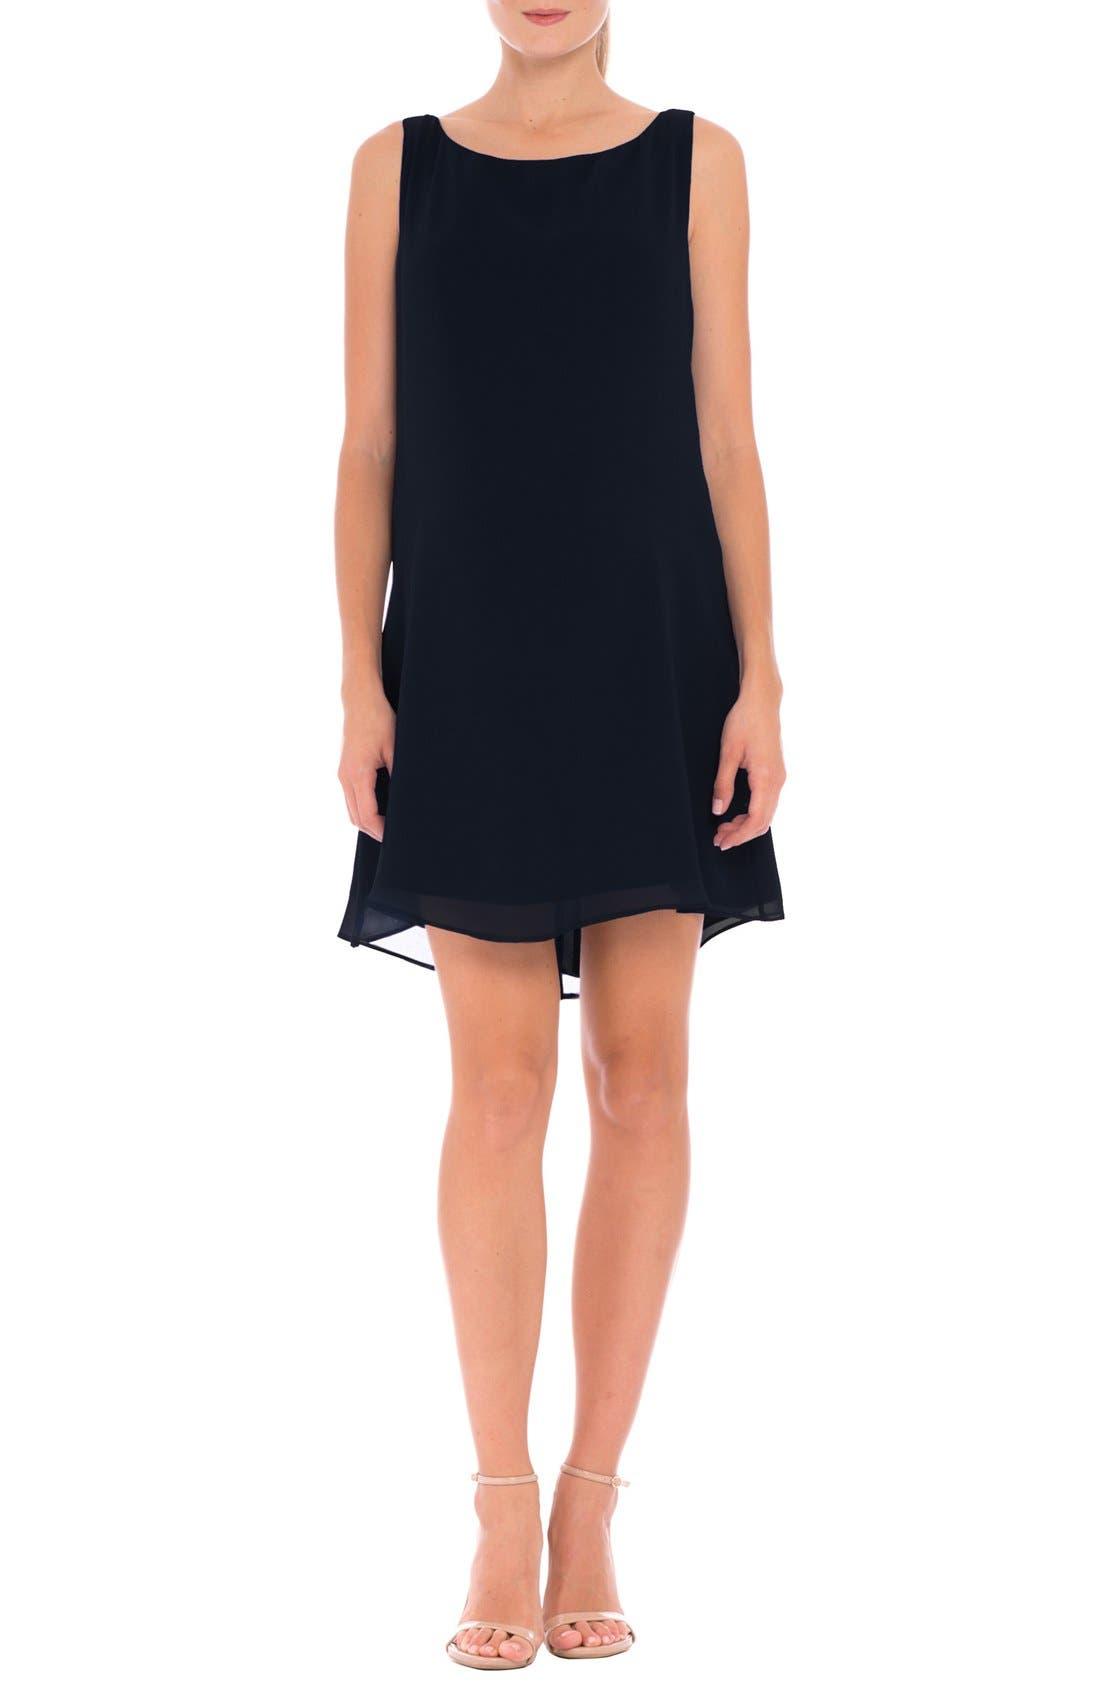 OLIAN 'Leah' Chiffon Maternity Dress